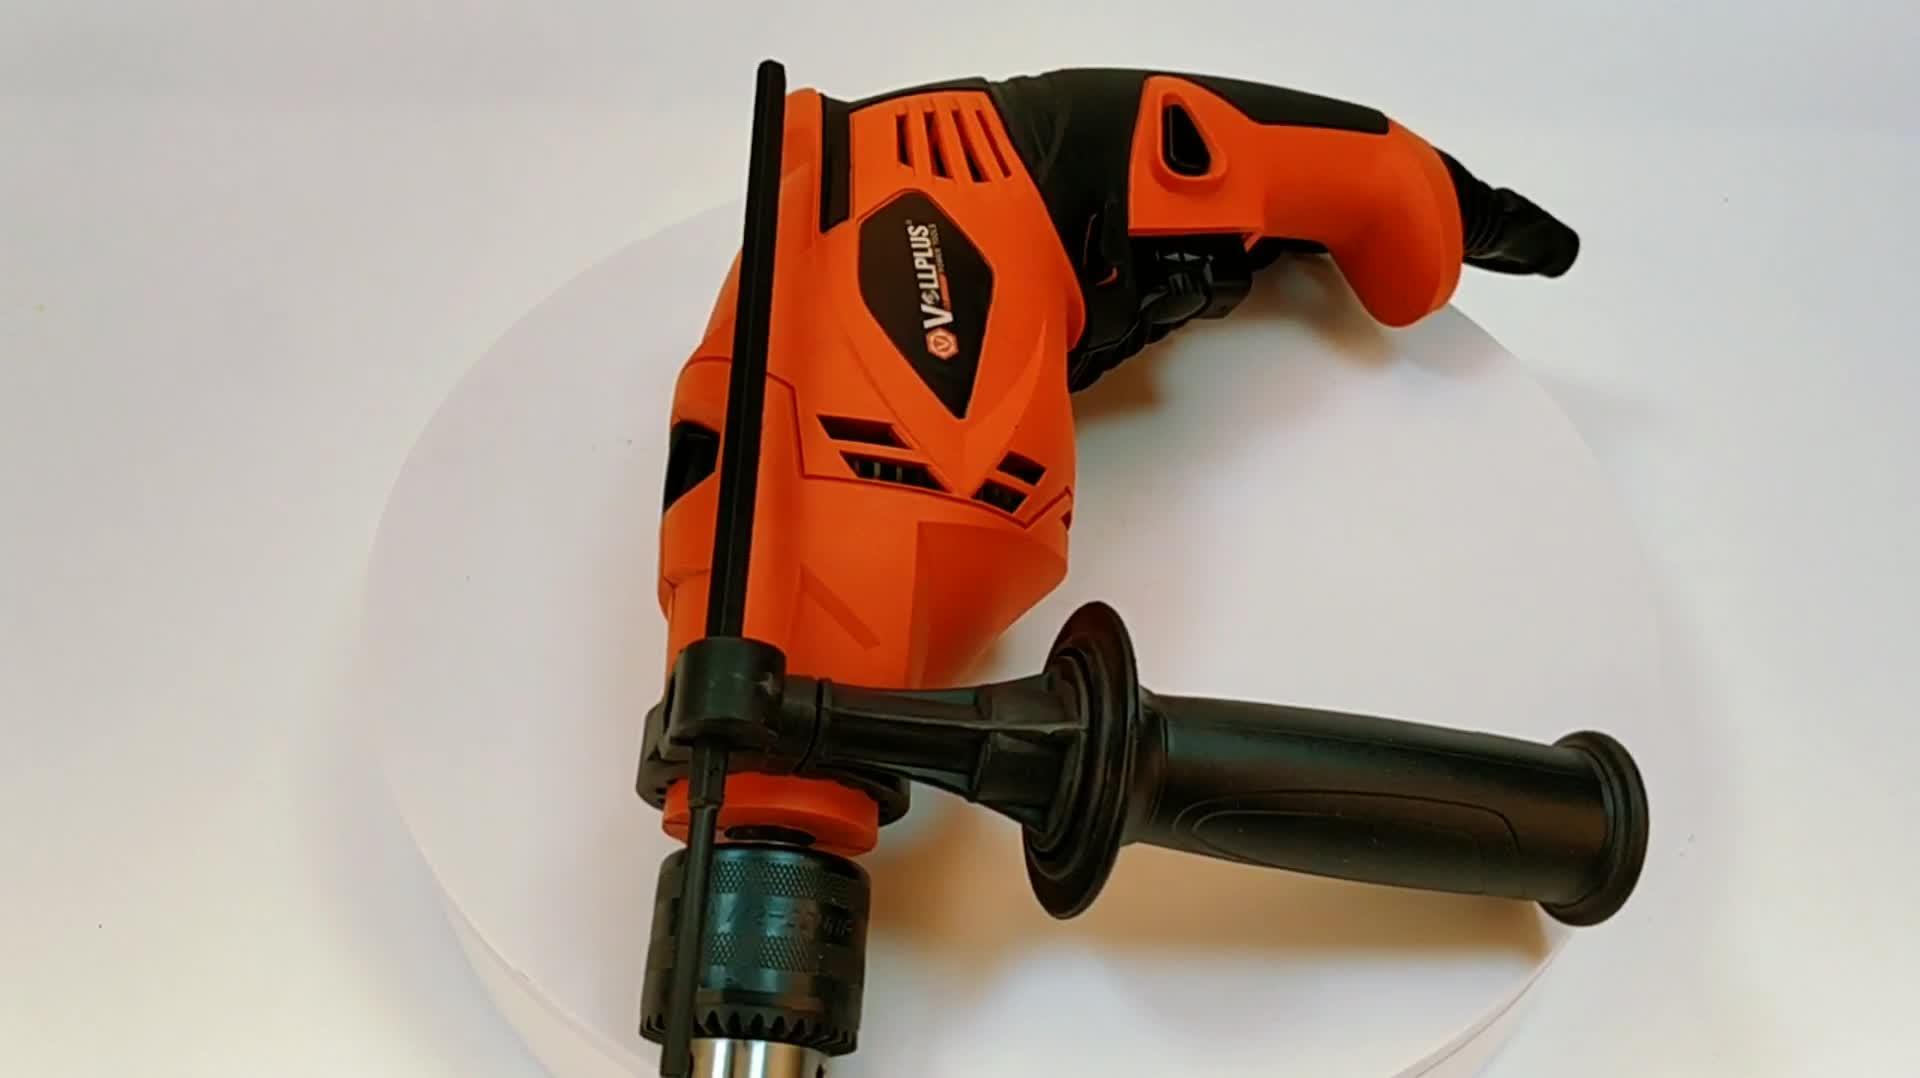 Vollplus Vpid1006 600w Hammer Drill 13mm High Quality ...